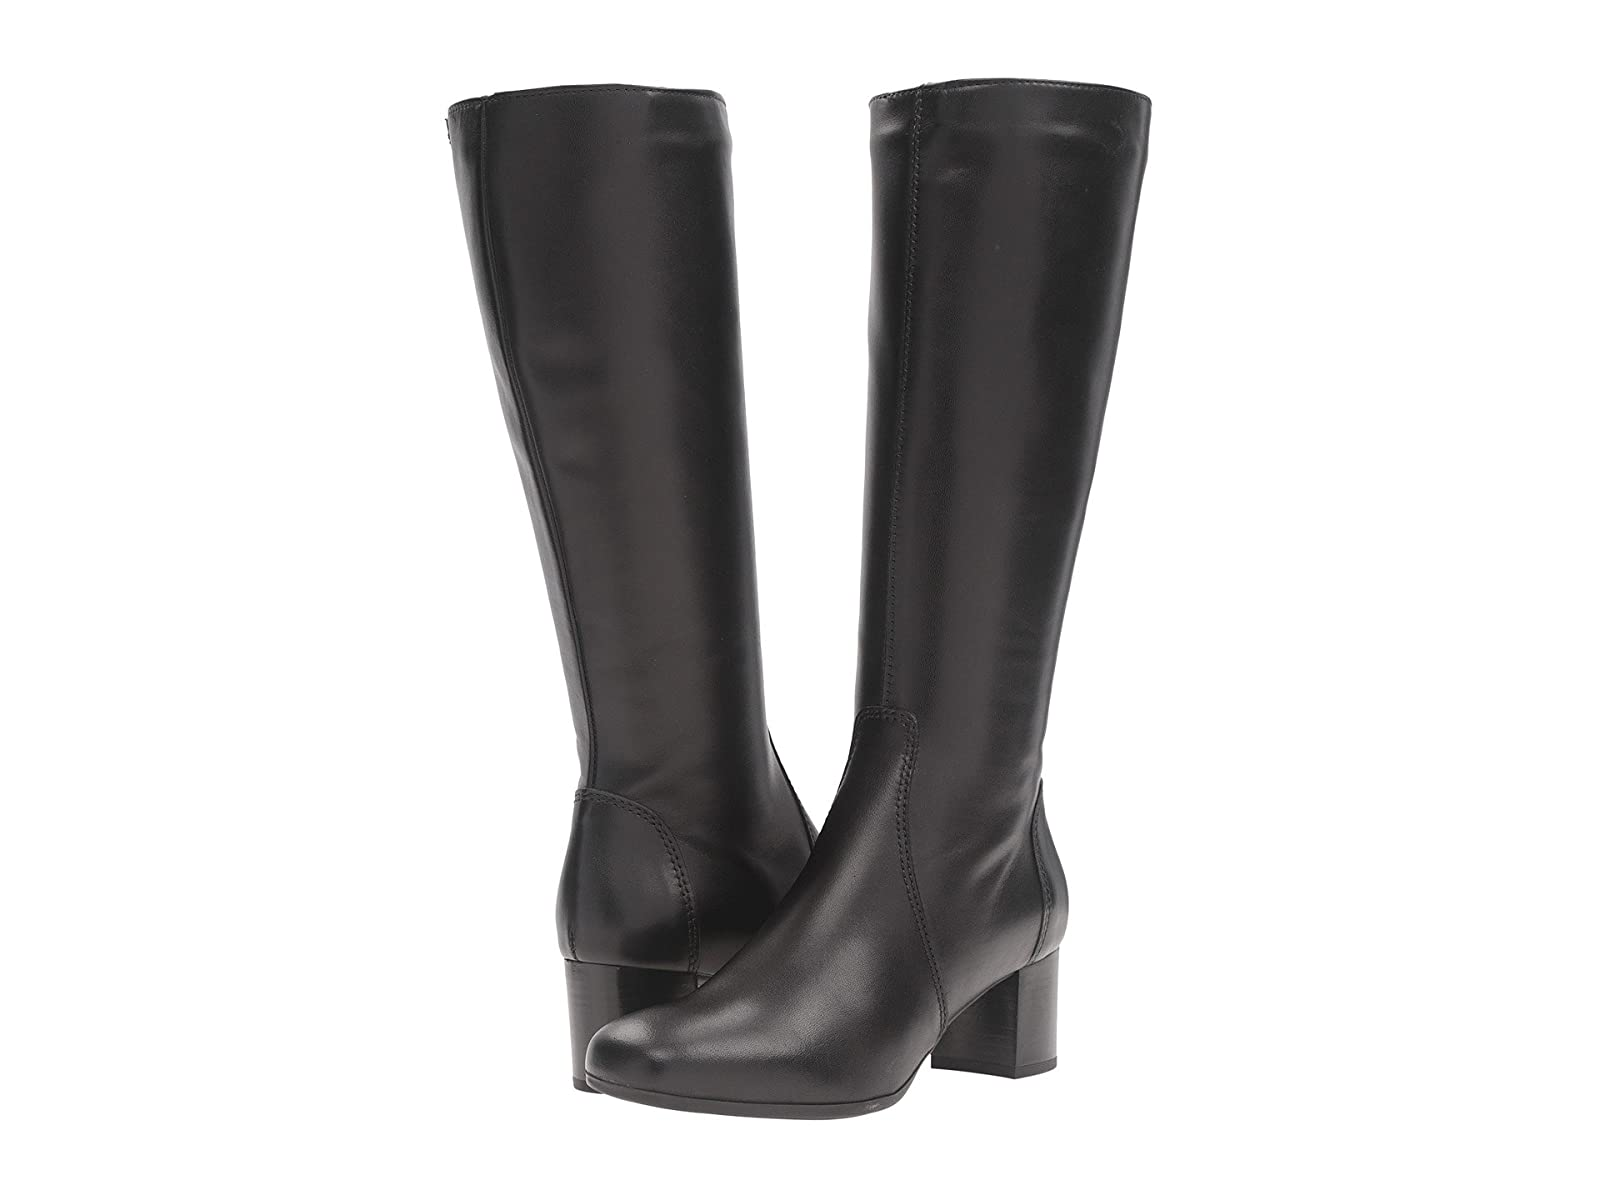 La Canadienne JenniferAffordable and distinctive shoes